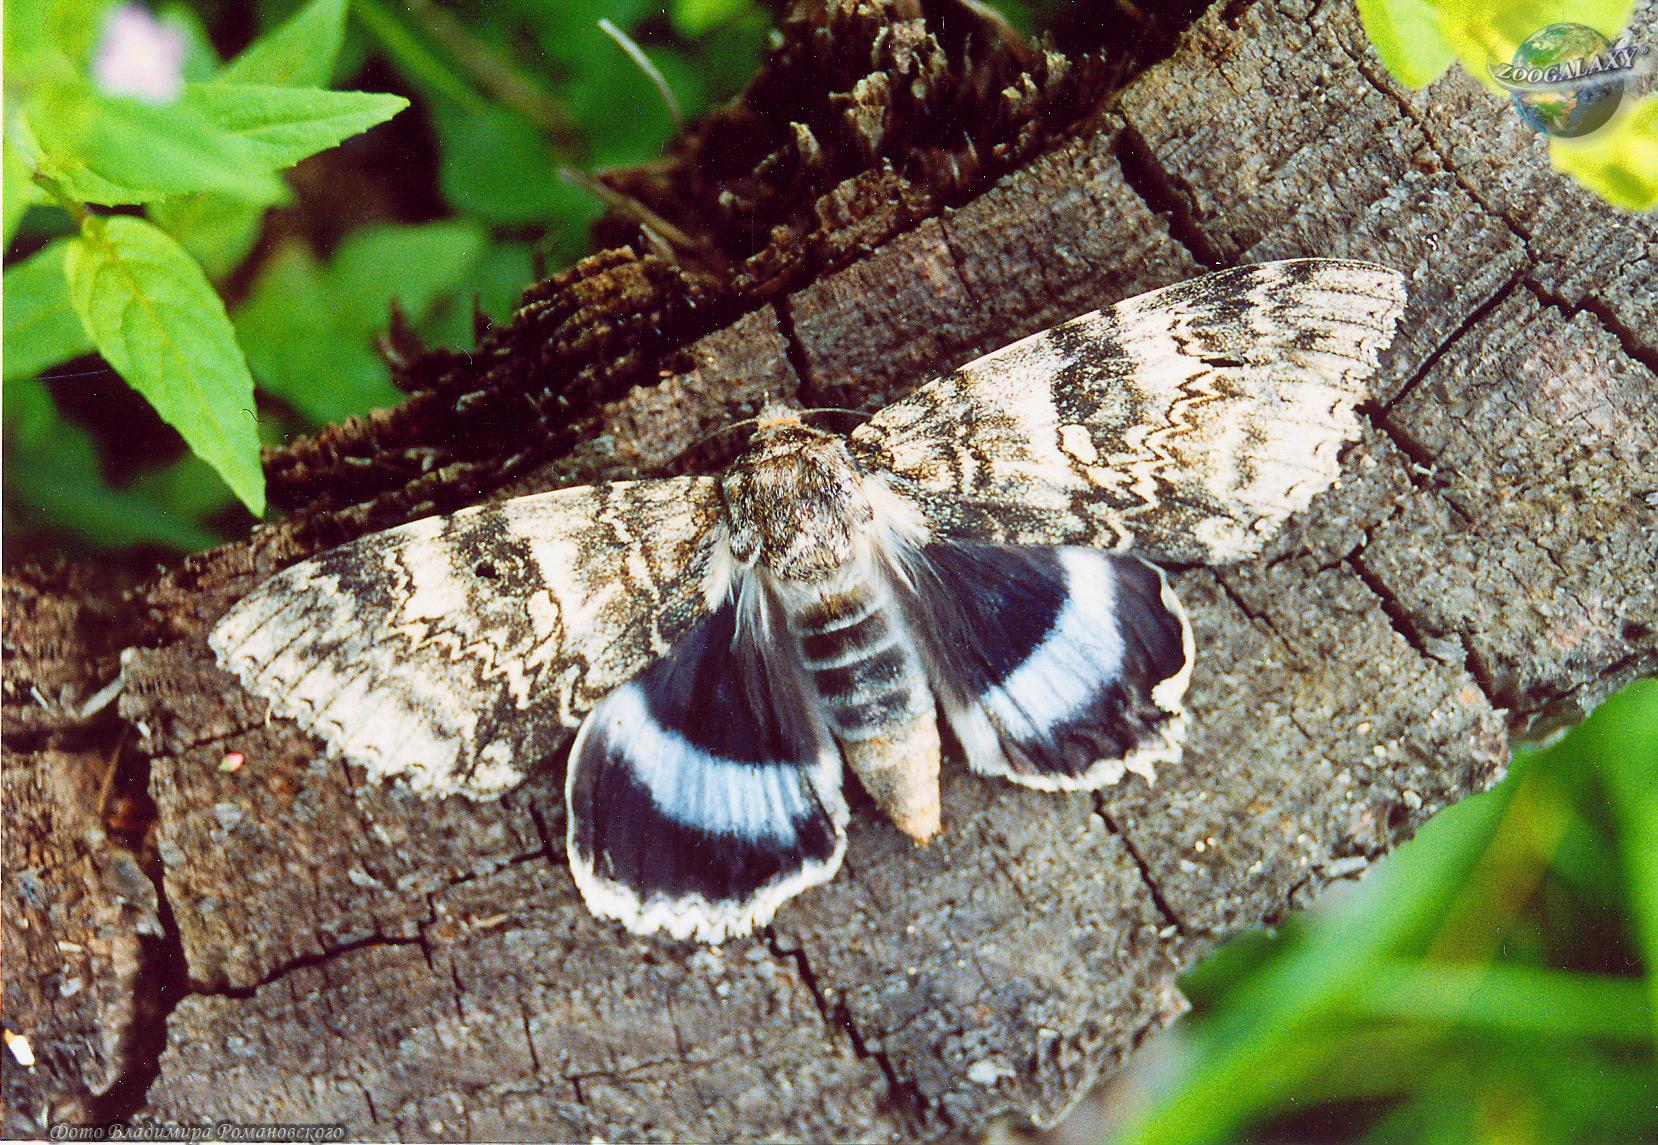 http://zoogalaxy.net/assets/images/invertebrata/arthropoda/insecta/lepidoptera/noctuidae/catocala-fraxini/catocala-fraxini_01_zoogalaxy.jpg